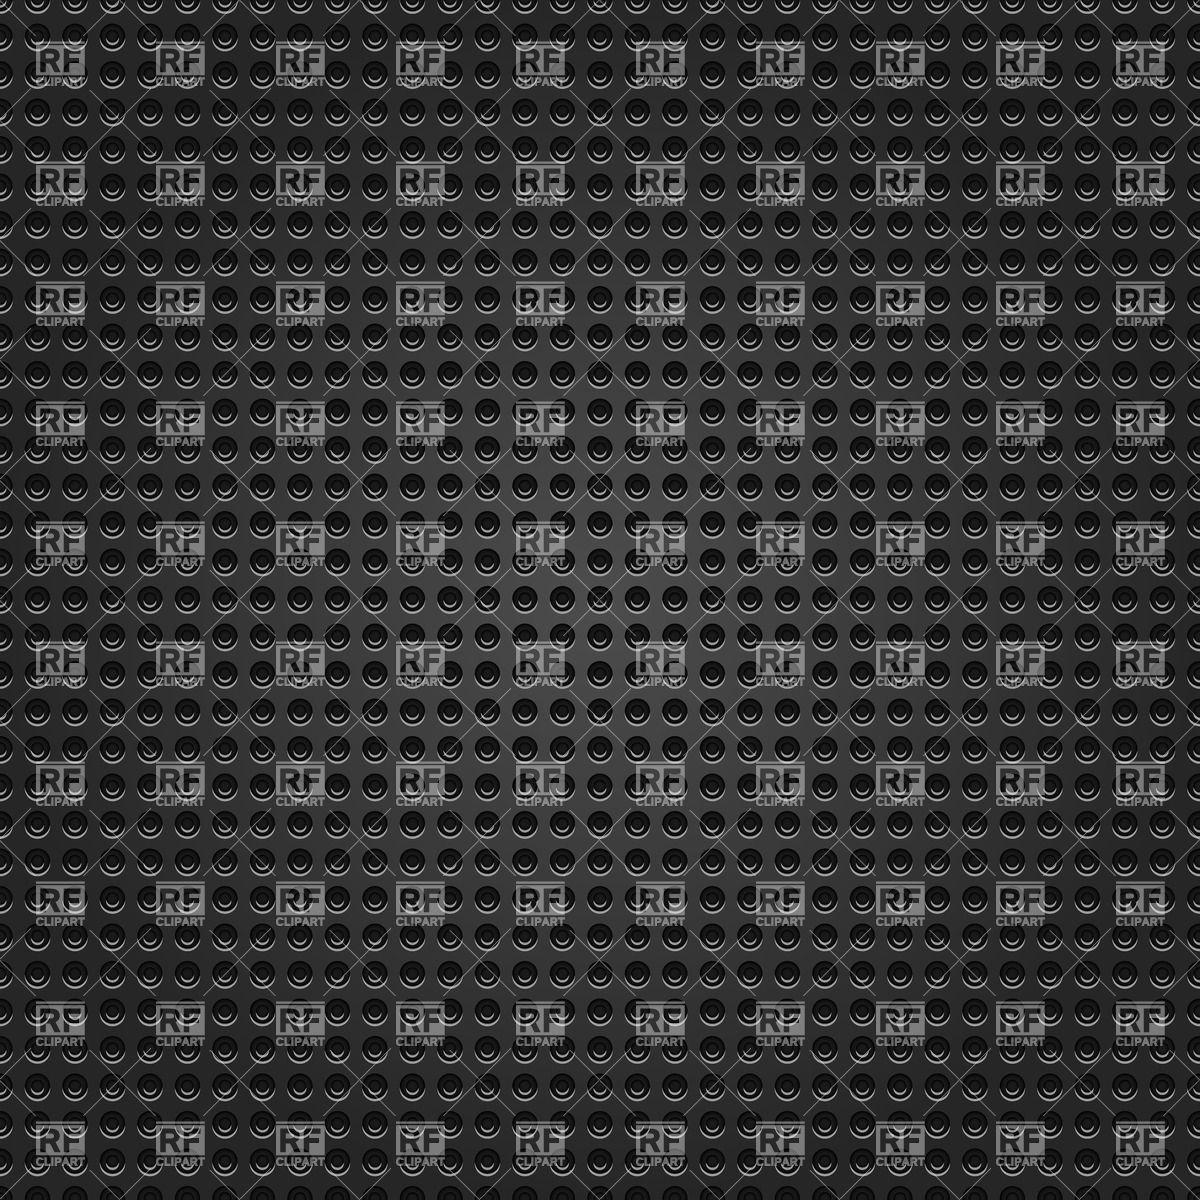 Perforated black metal grid background Vector Image #15379.